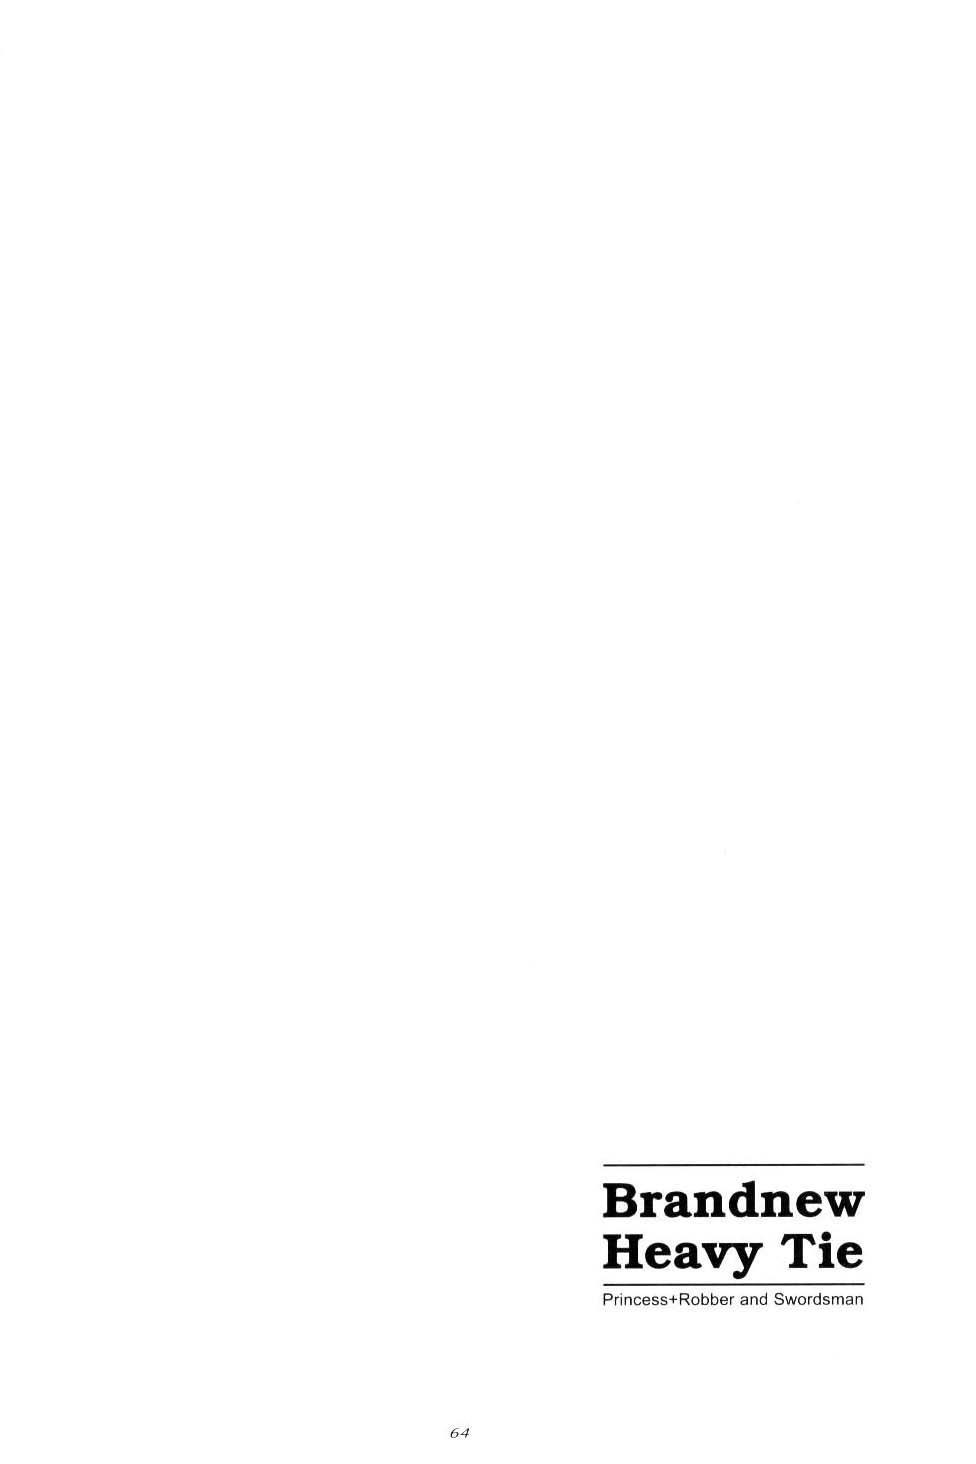 Brandnew Heavy Tie 61